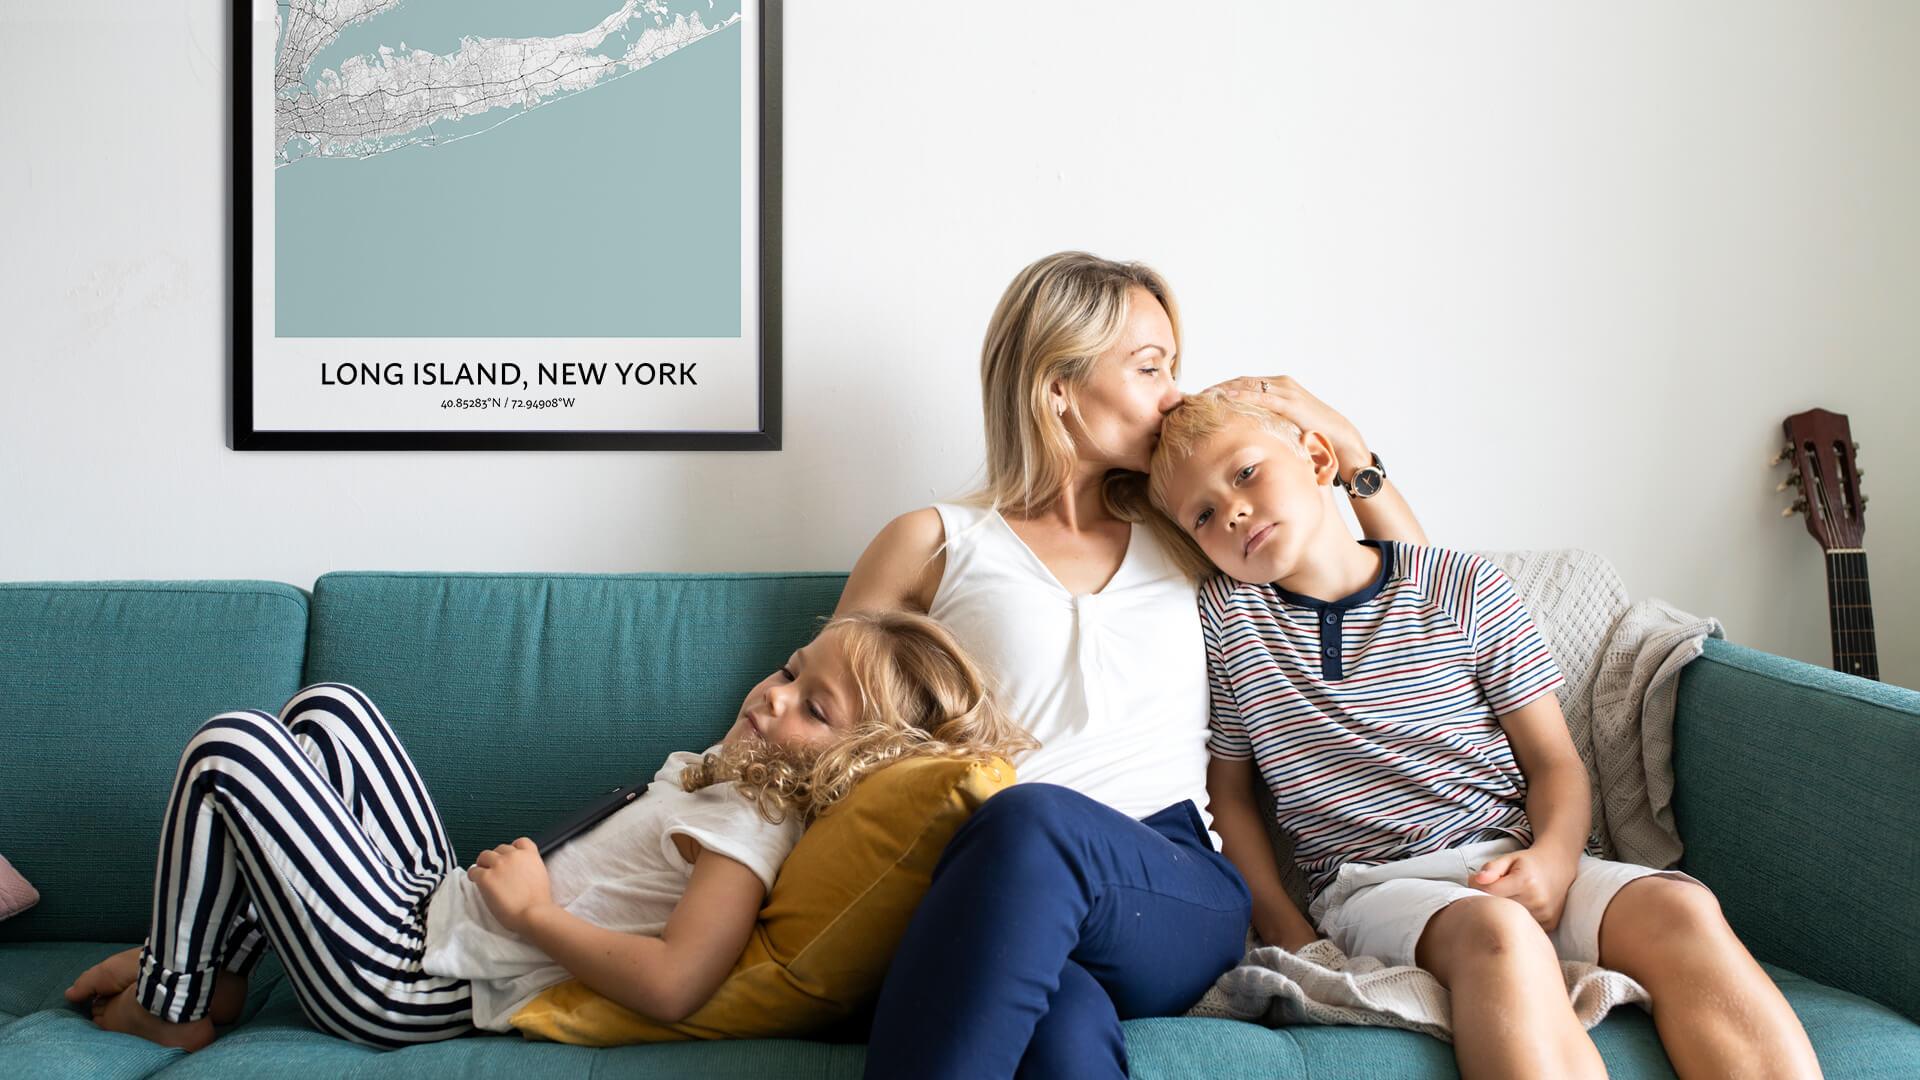 Long Island map poster